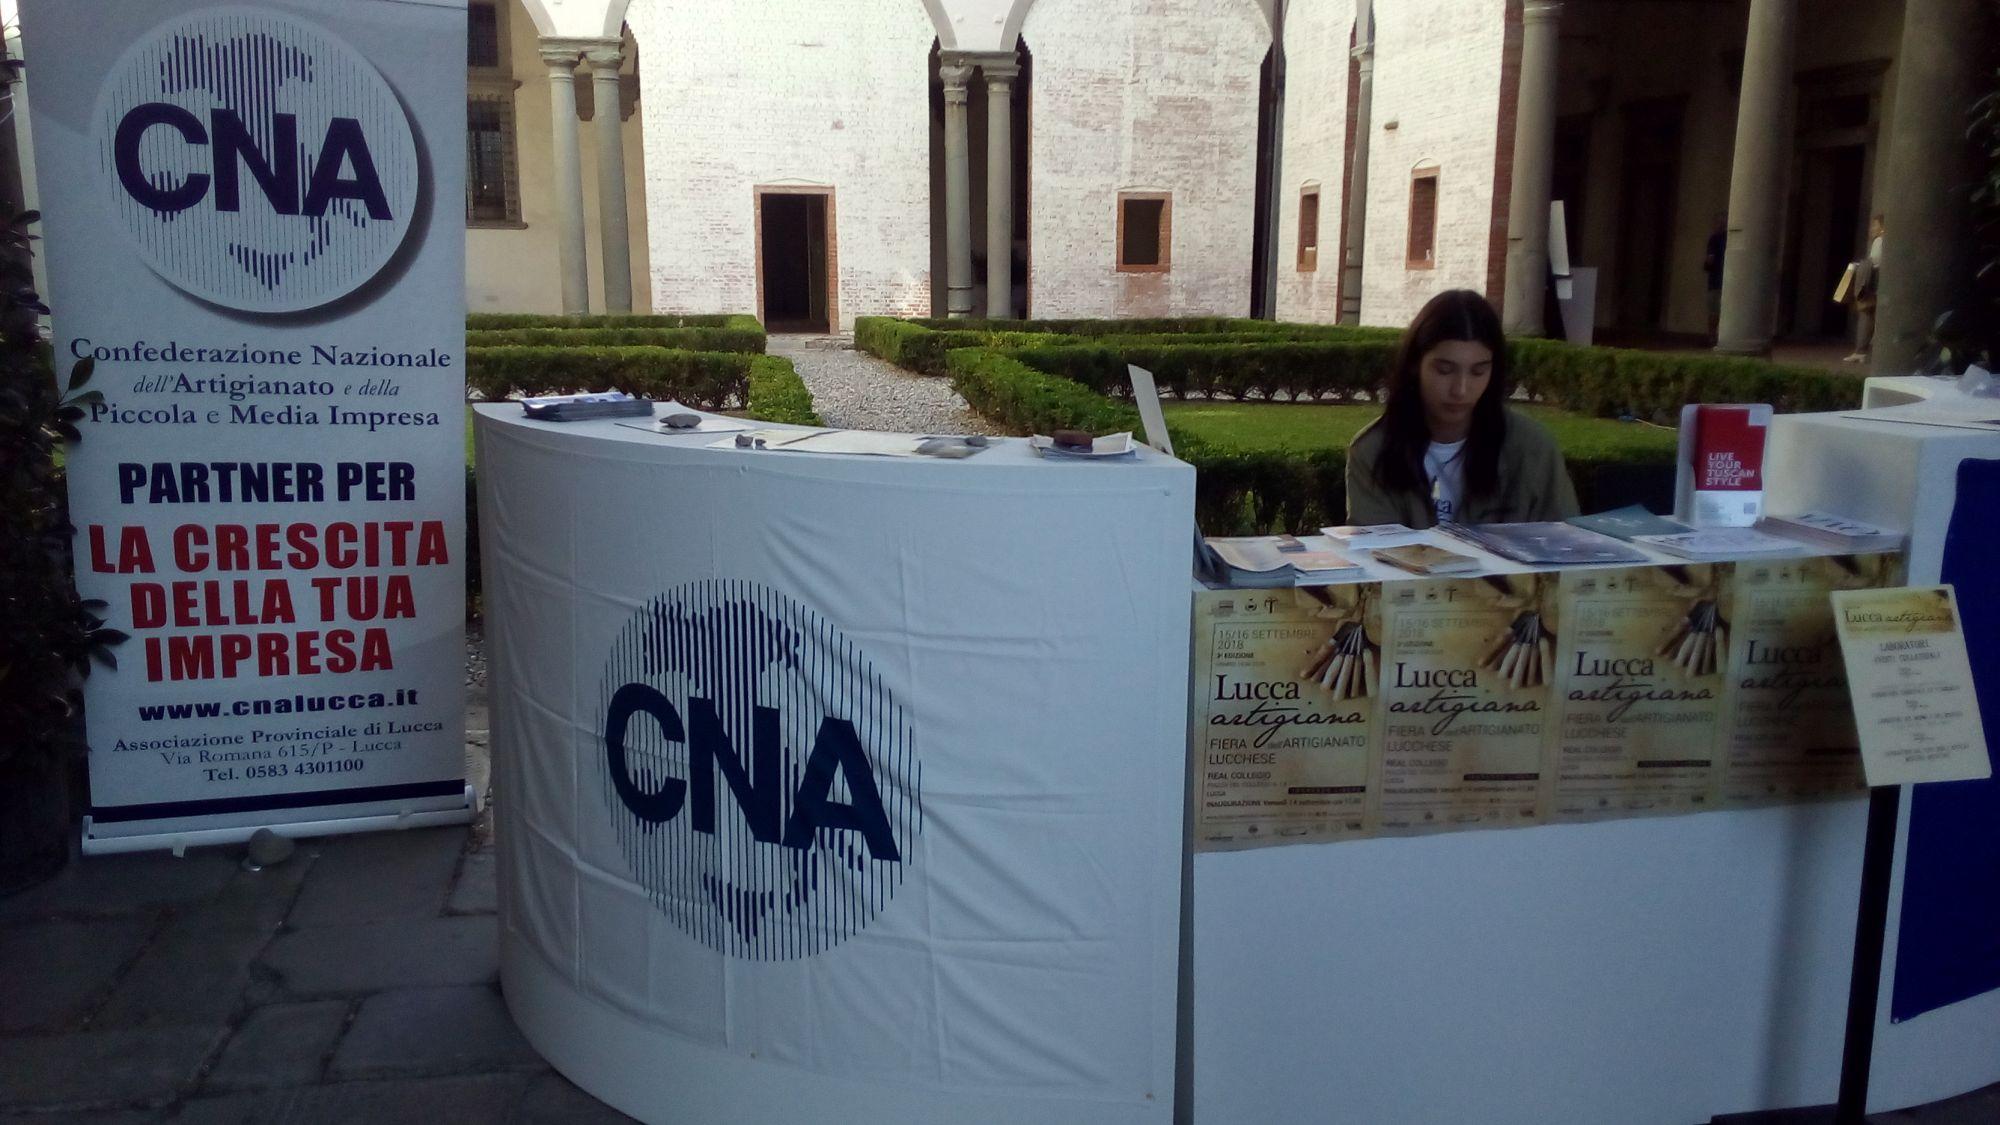 Cna, incontro con le imprese a Pietrasanta